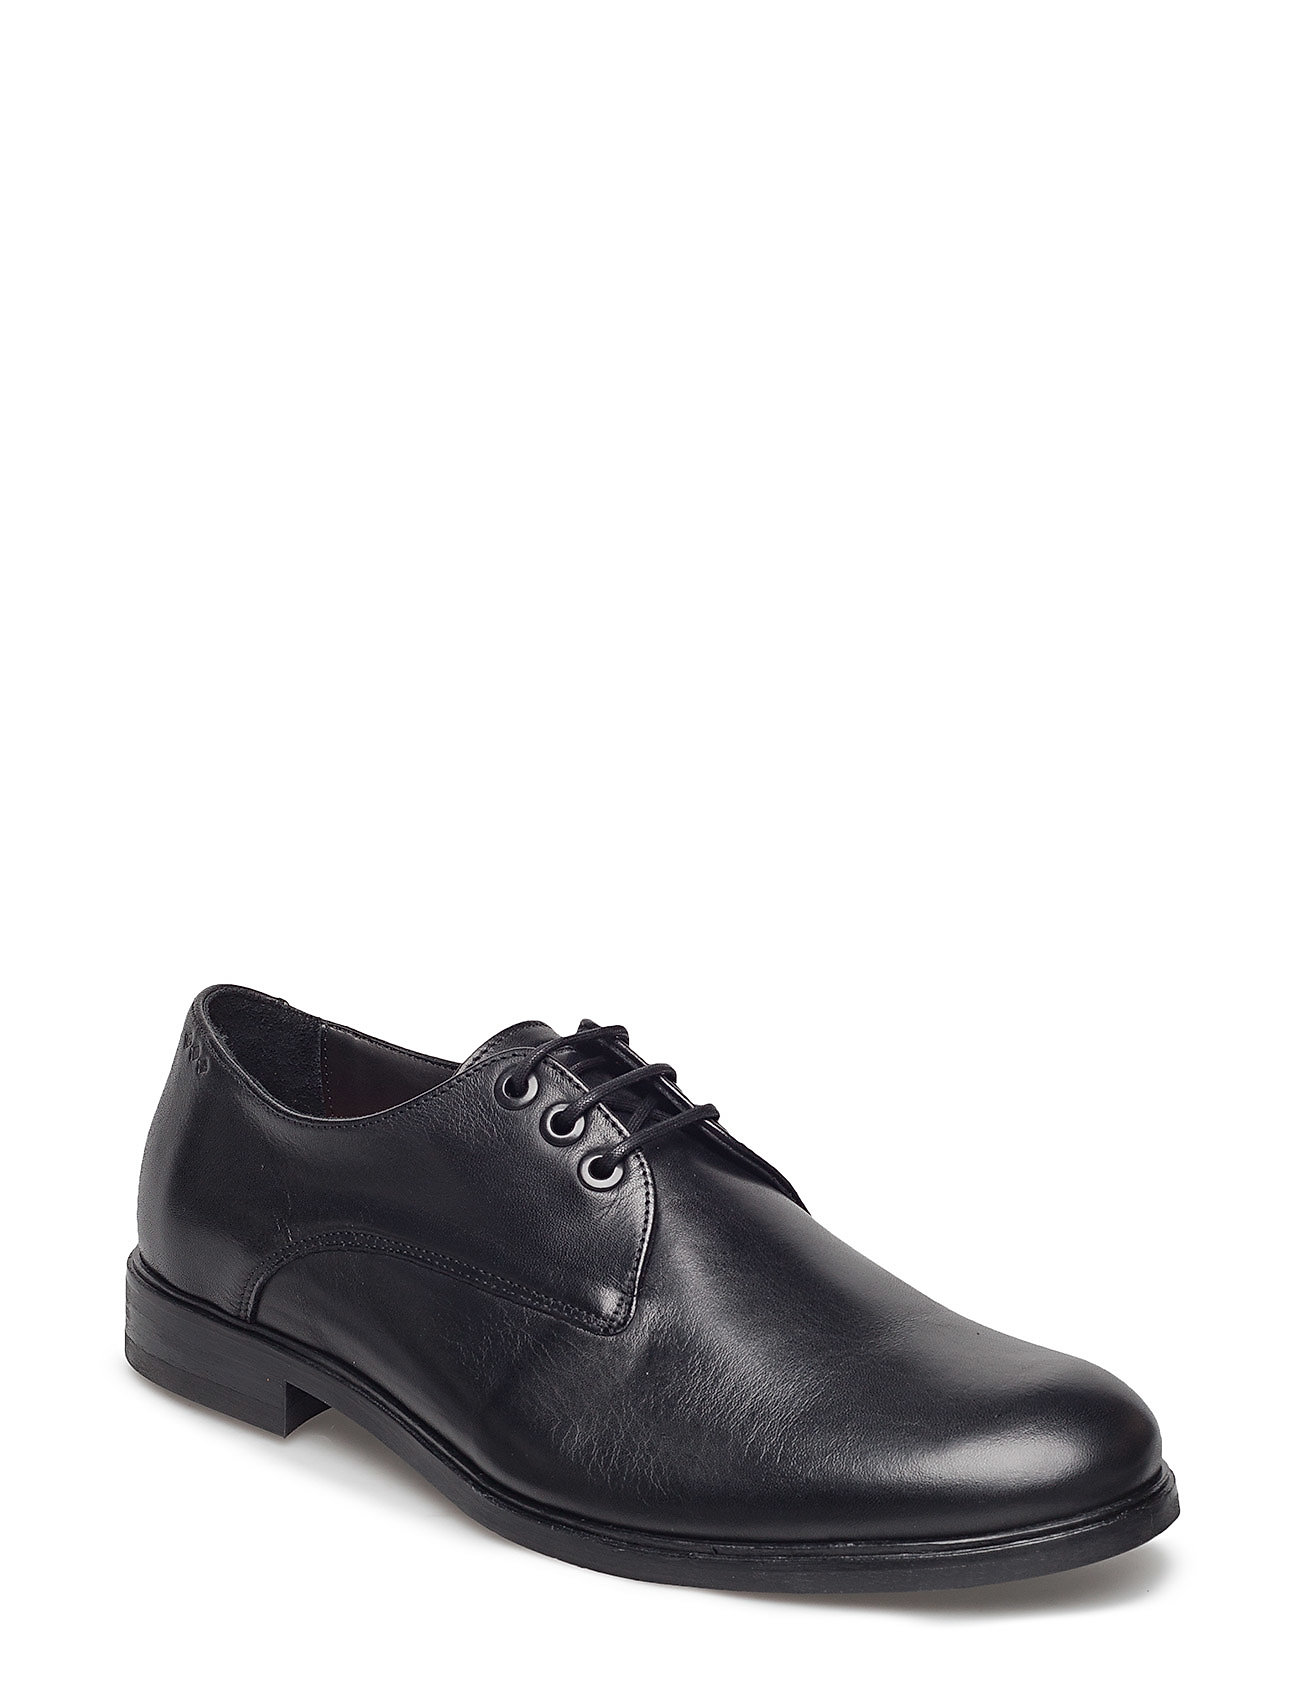 Shoe black Classic Alias Derby 99 YBx6EwX